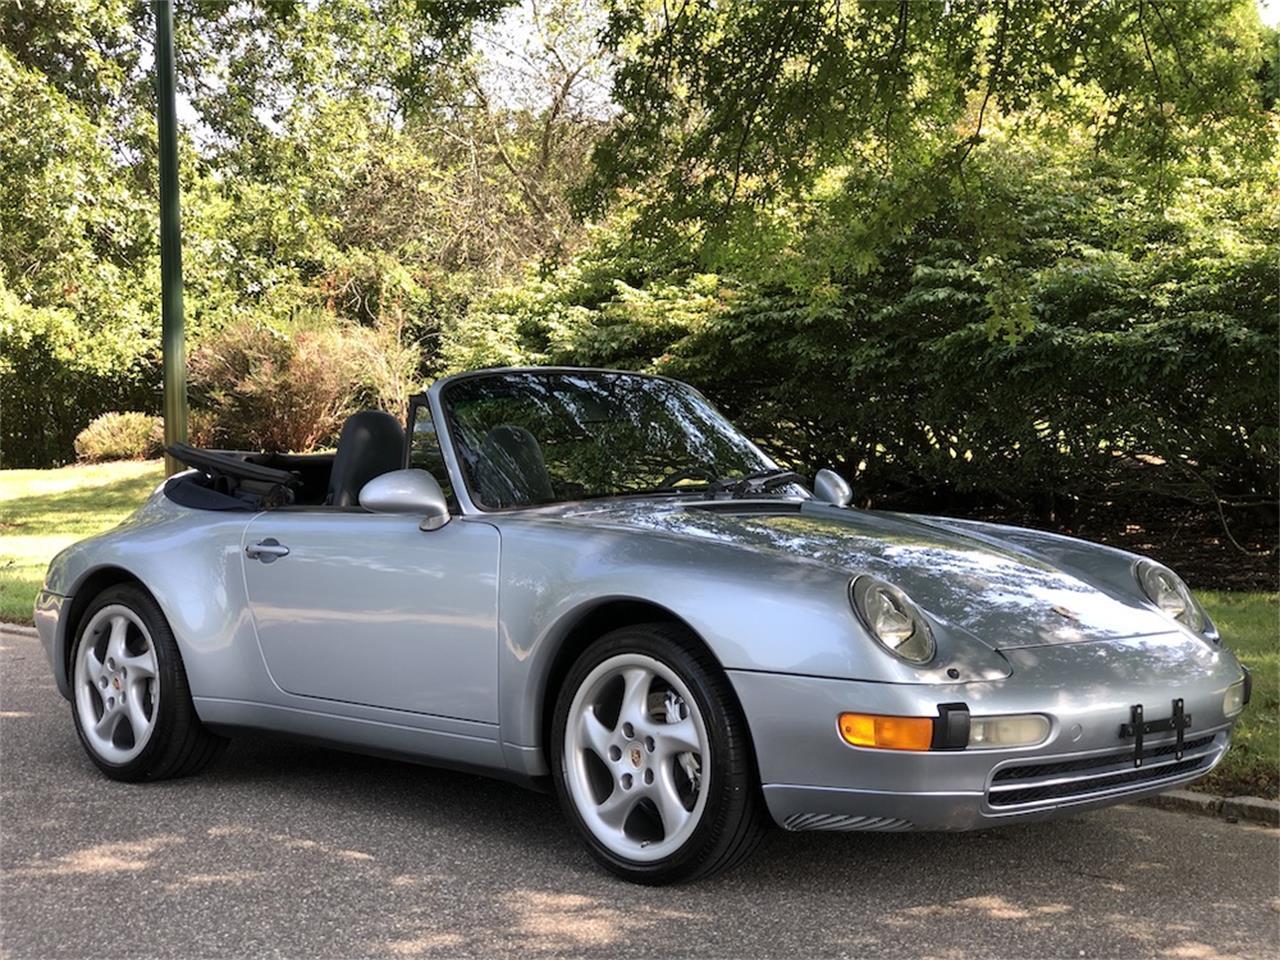 1997 Porsche 911 Carrera 4 Cabriolet (CC-1385676) for sale in SOUTHAMPTON, New York